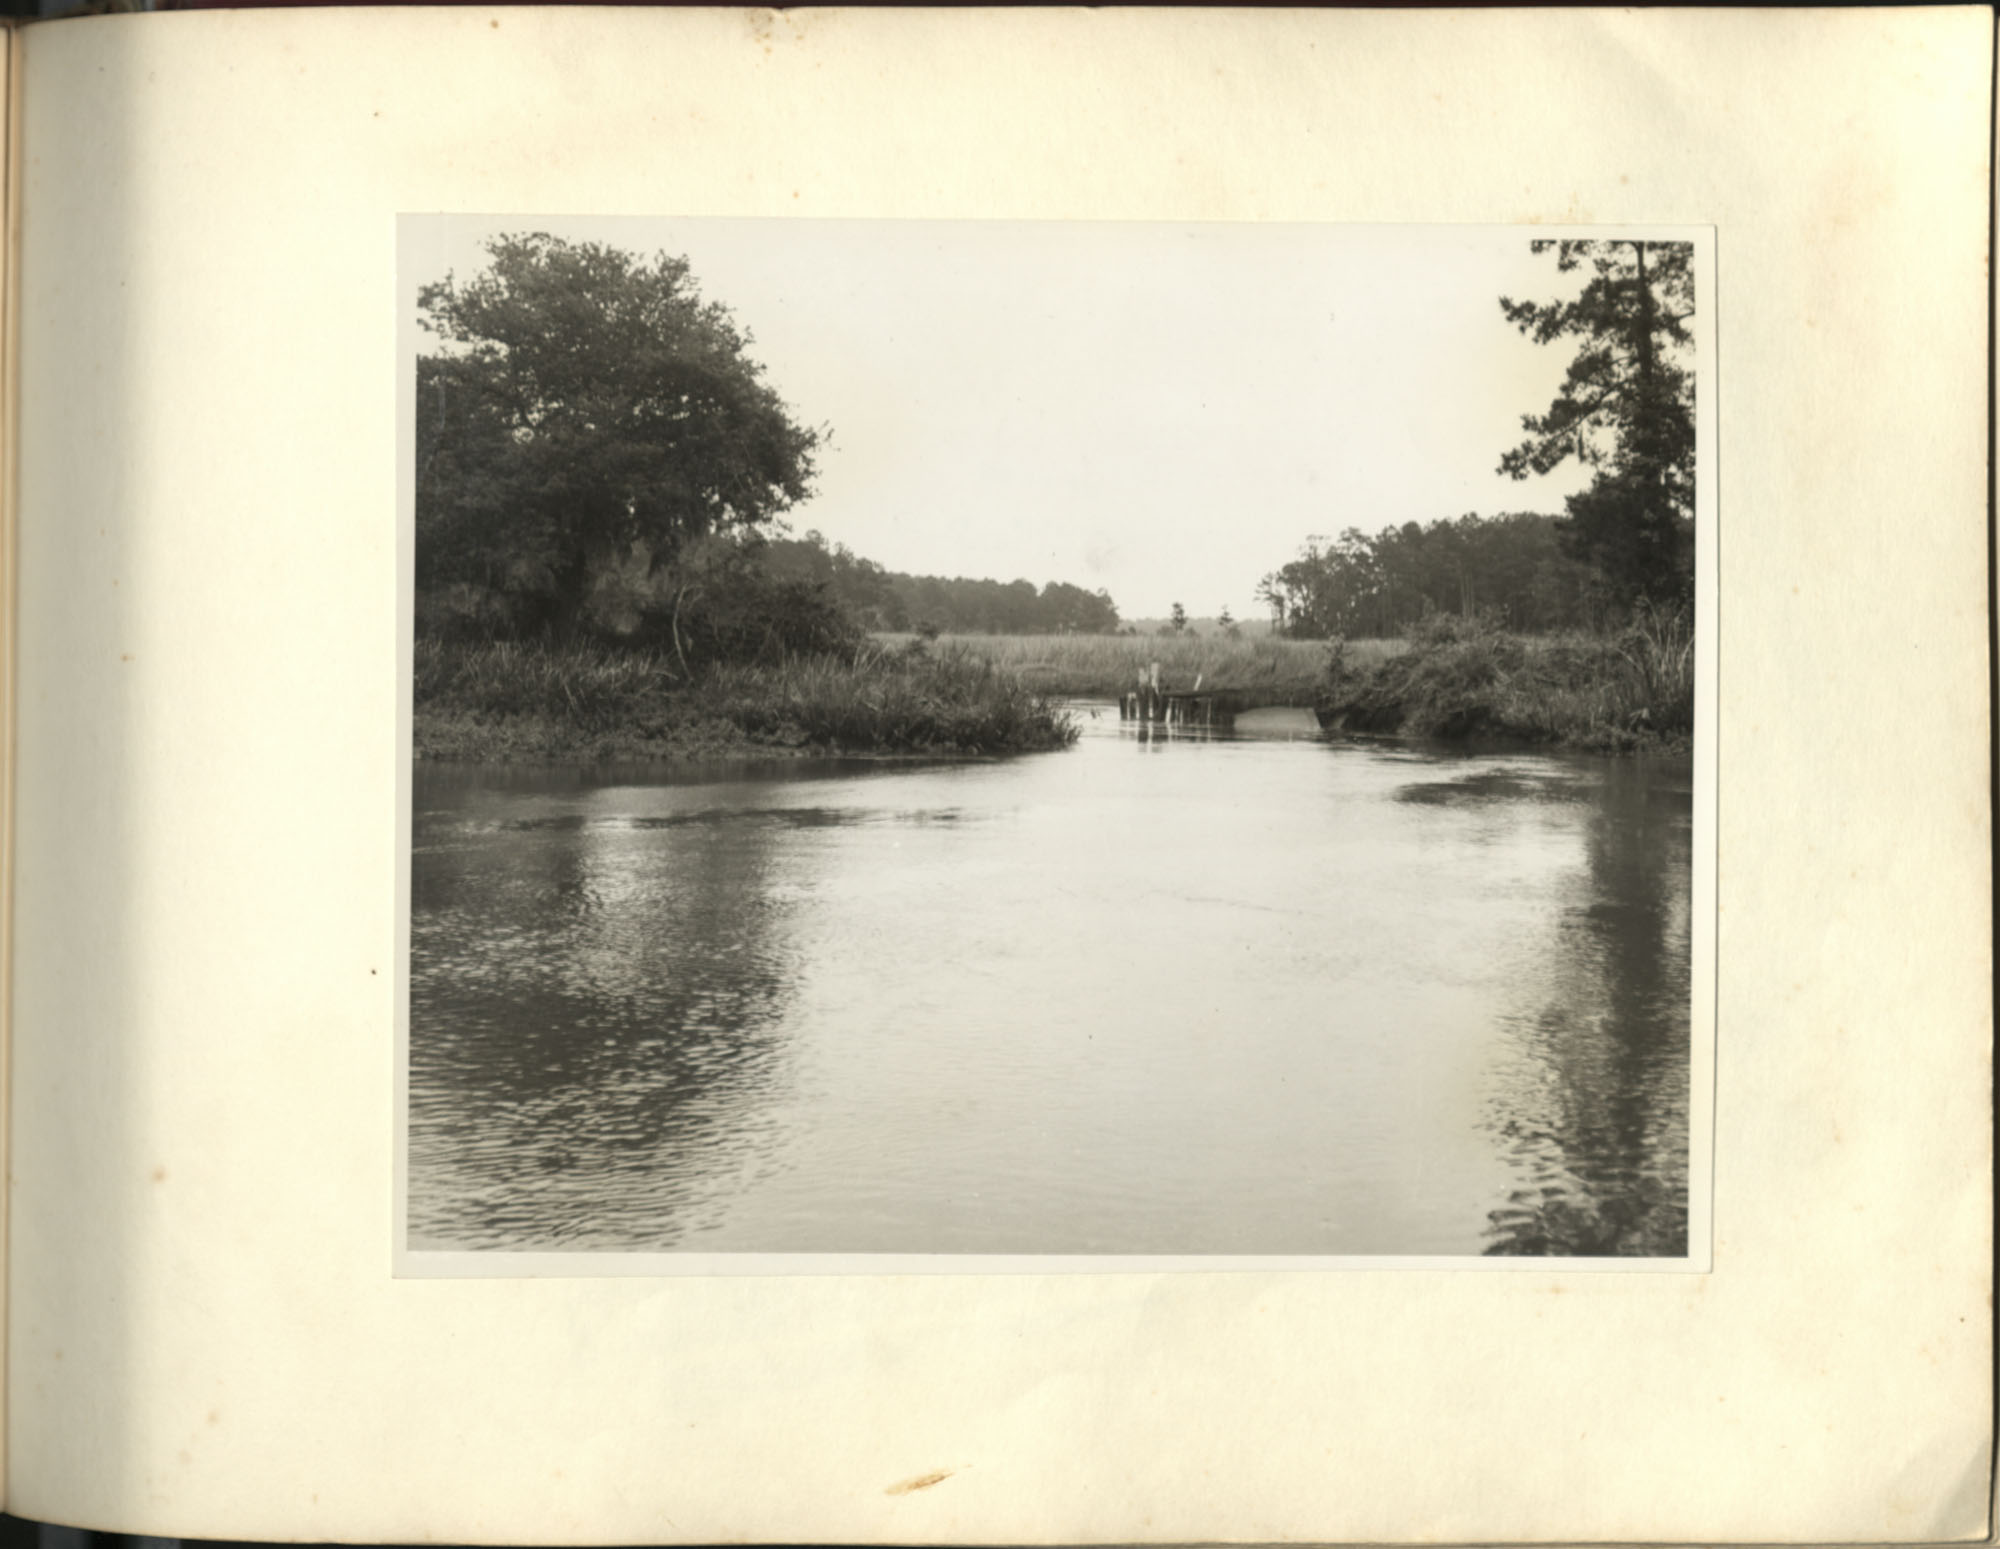 Medway Plantation Photograph Album, 1949, page 139